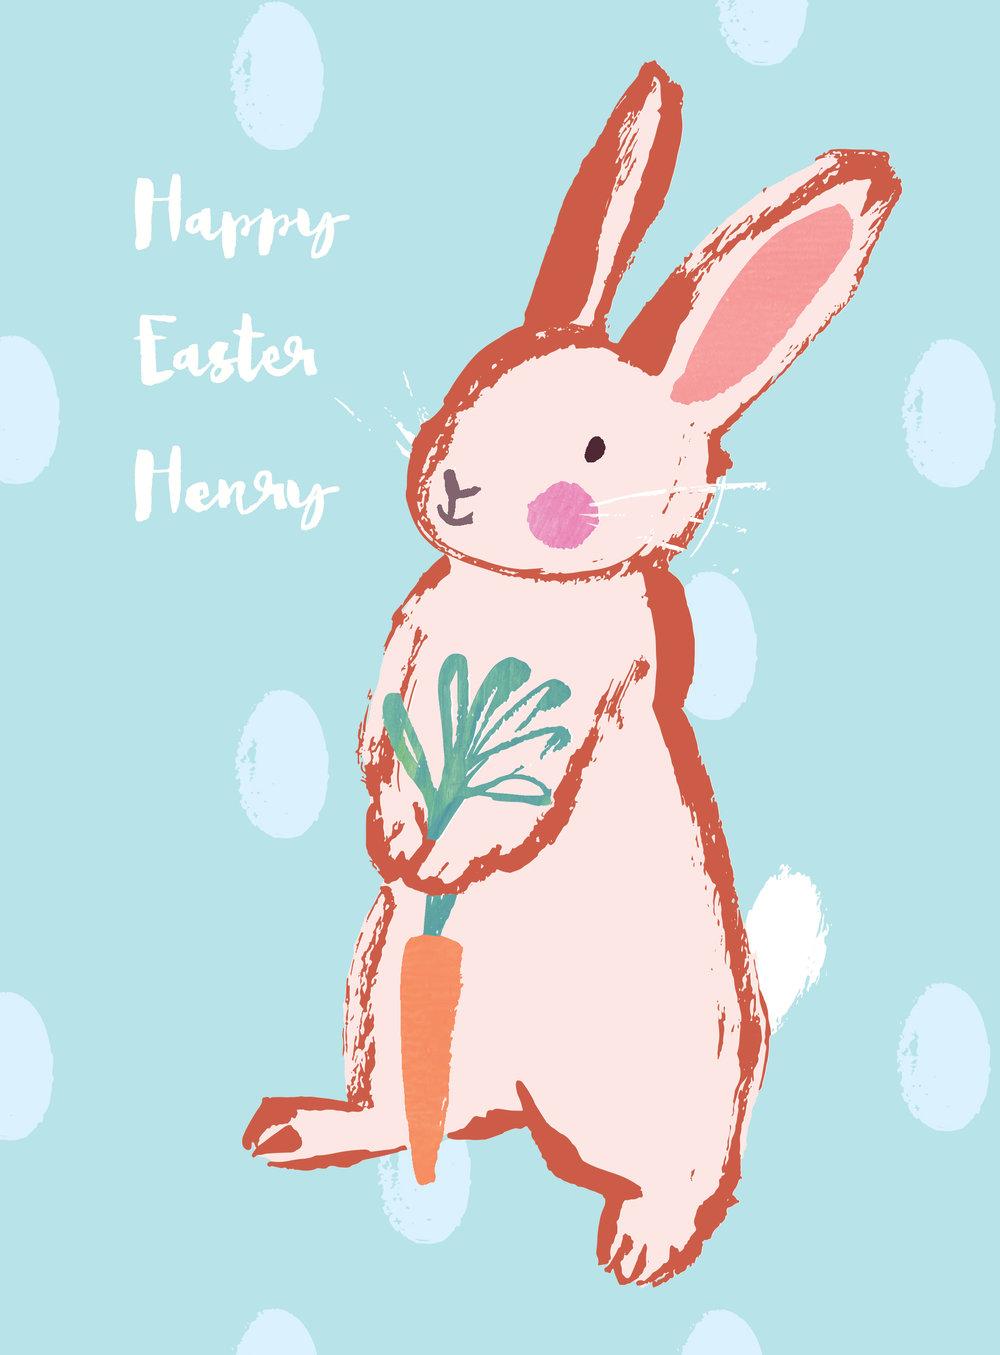 easter-bunny-greeting-card-artwork.jpg